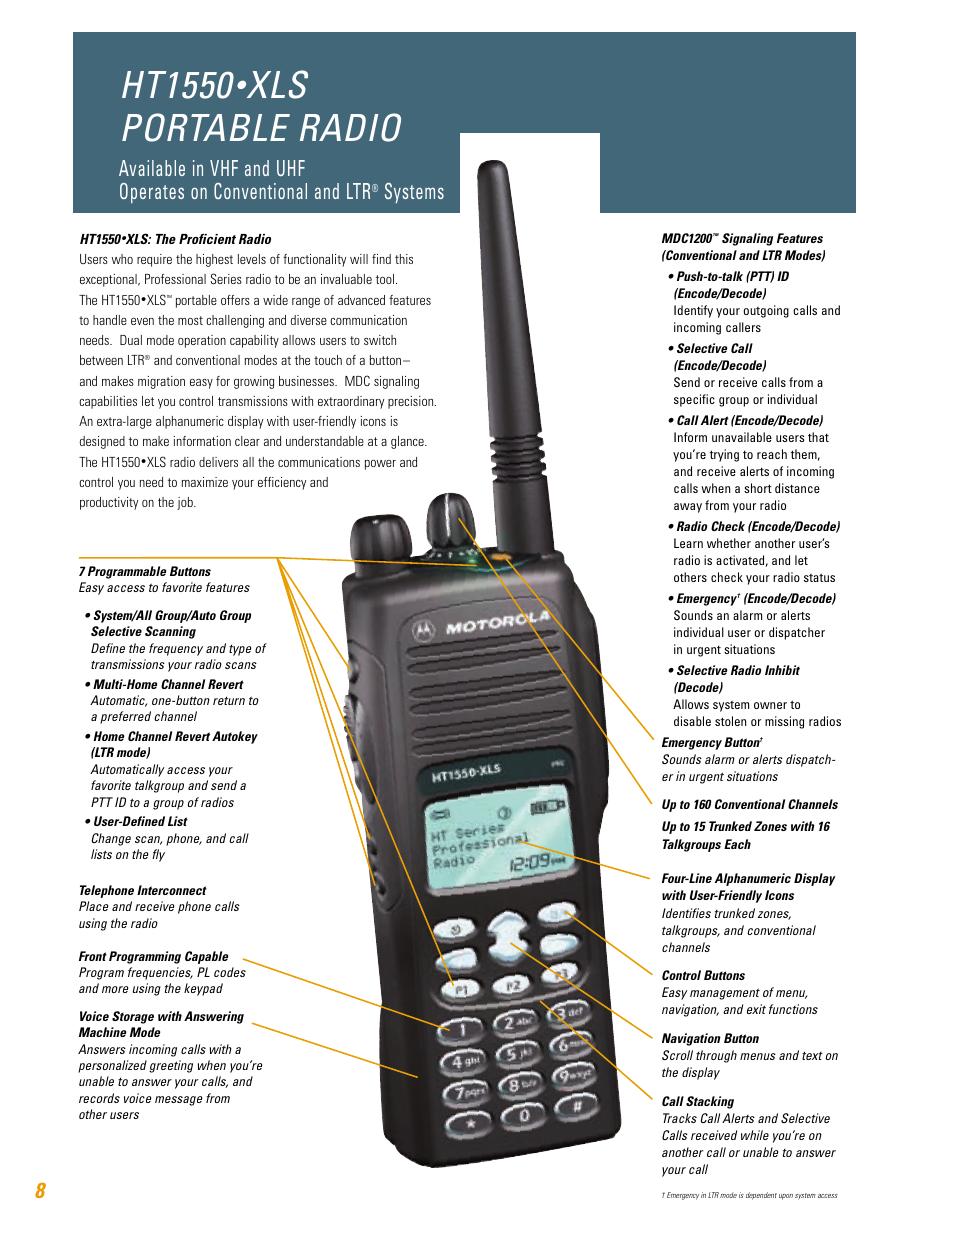 ht1550 xls portable radio systems motorola ht750 user manual rh manualsdir com motorola flip phone user manual motorola phone ce0168 user manual